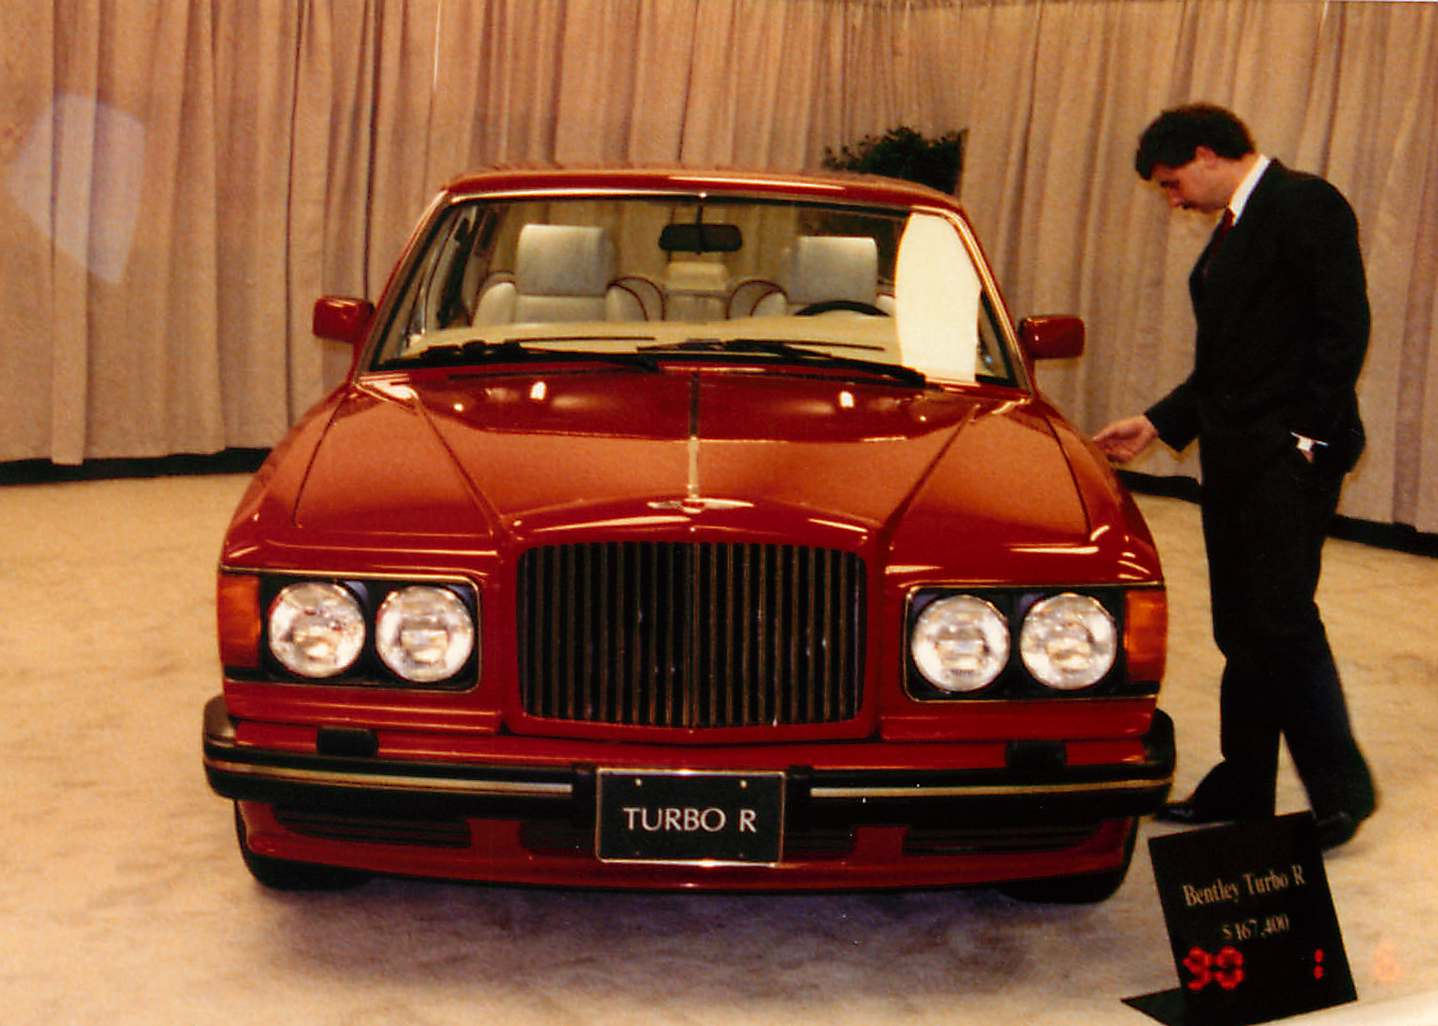 Tamerlane's Thoughts: 1990 Los Angeles Auto Show pictures on ford cars, chrysler cars, maybach cars, porsche cars, jaguar cars, rolls-royce cars, benz cars, hyundai cars, mercedes cars, audi cars, maserati cars, mg cars, mclaren cars, nissan cars, lamborghini cars, ferrari cars, aston martin cars, bmw cars, pontiac cars, volvo cars,